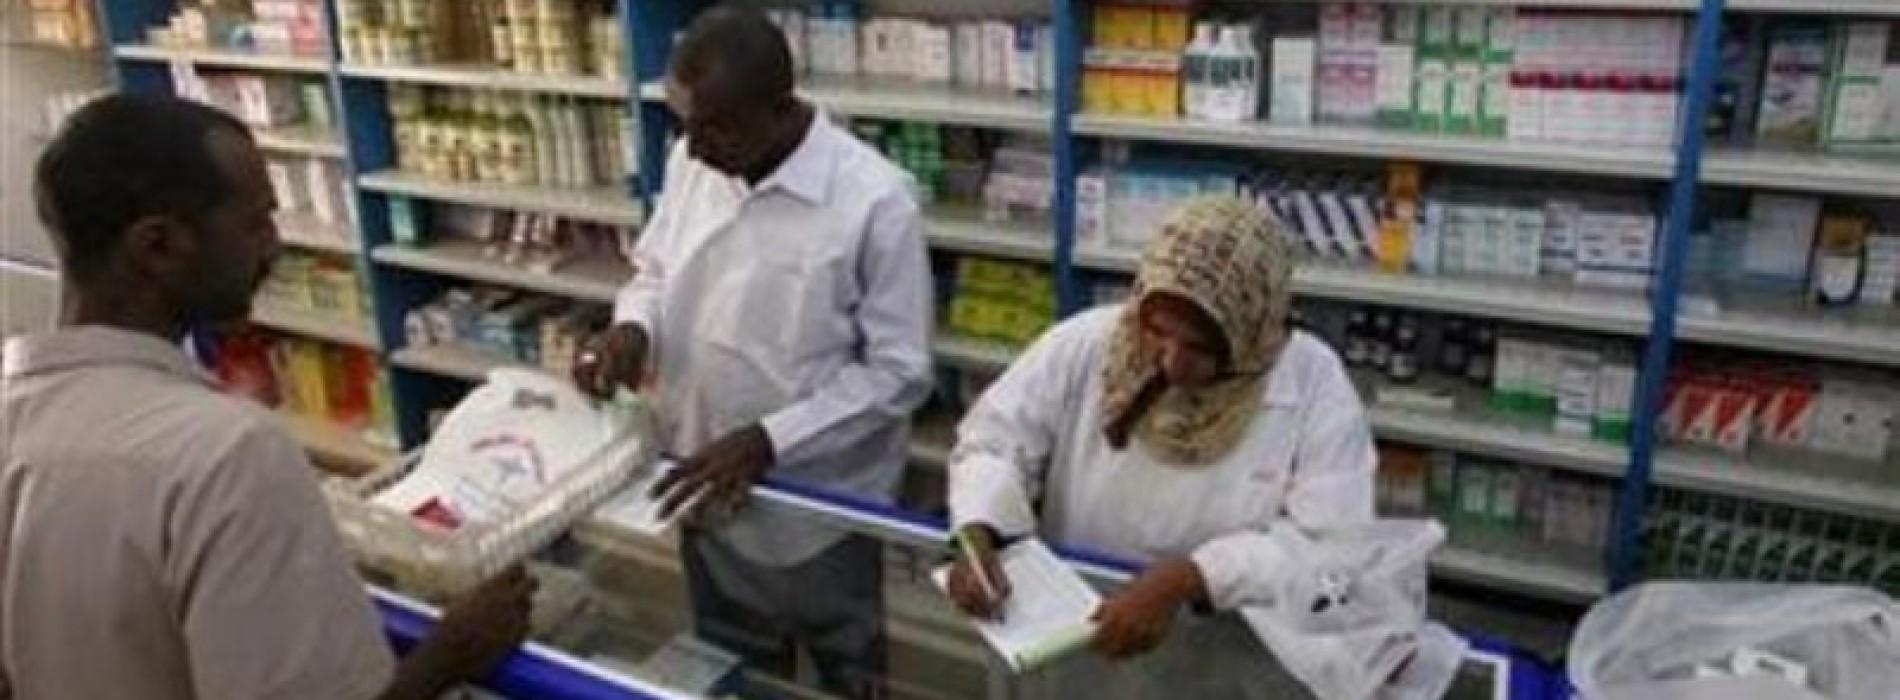 Drug scarcity hits Sudan